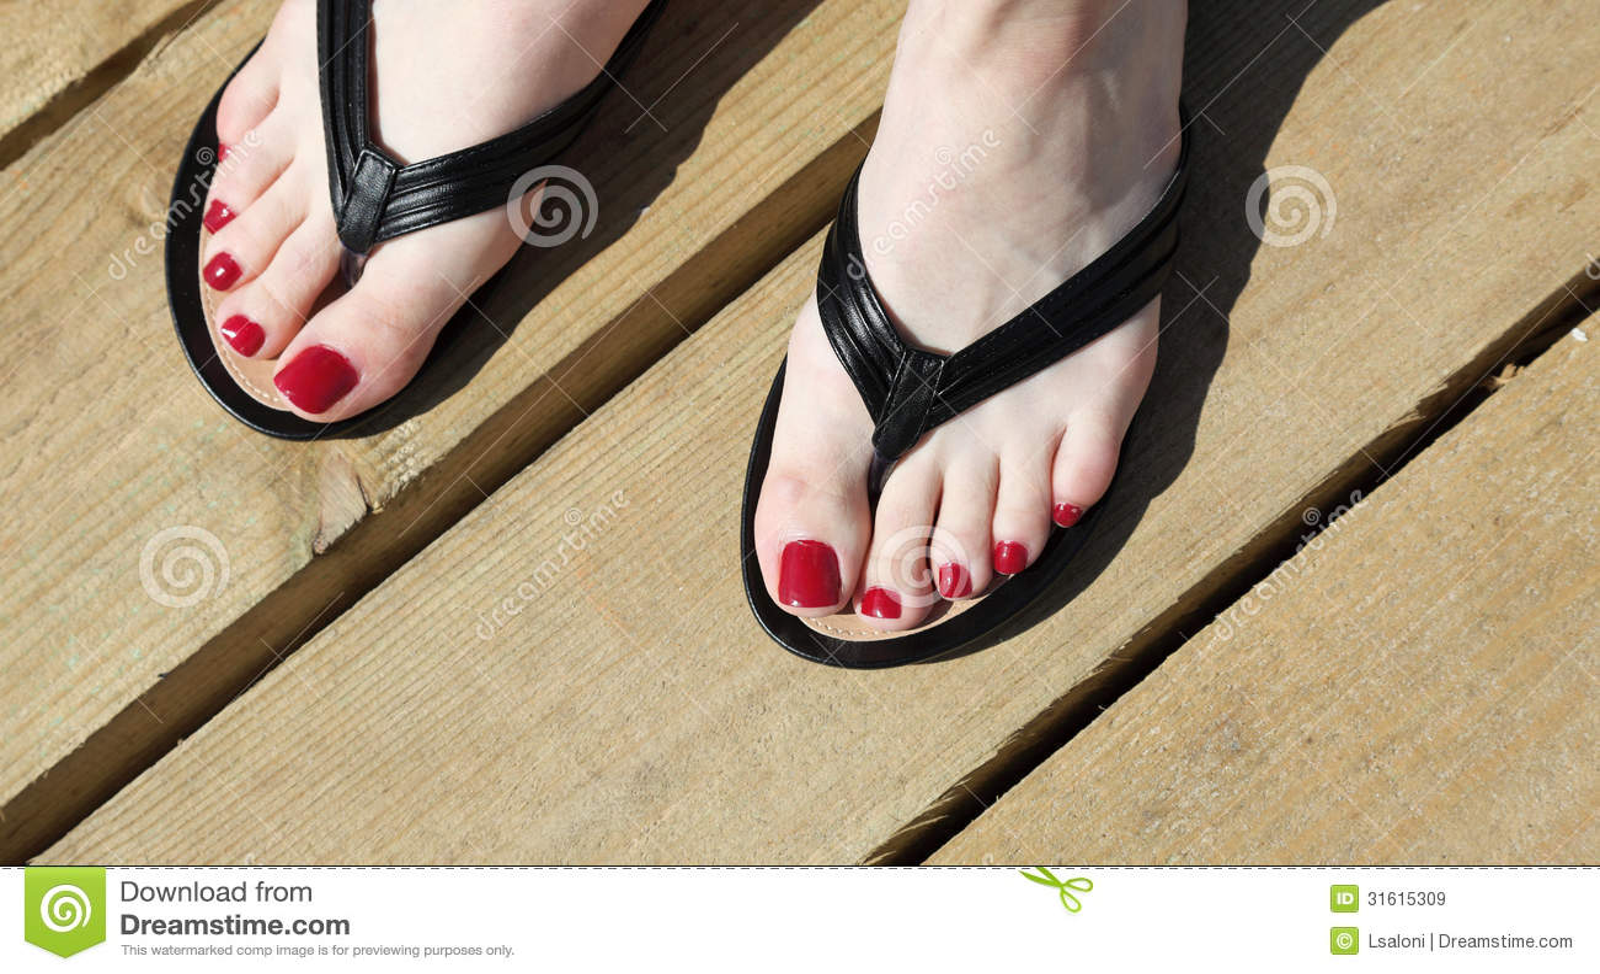 Flip flop feet will refrain